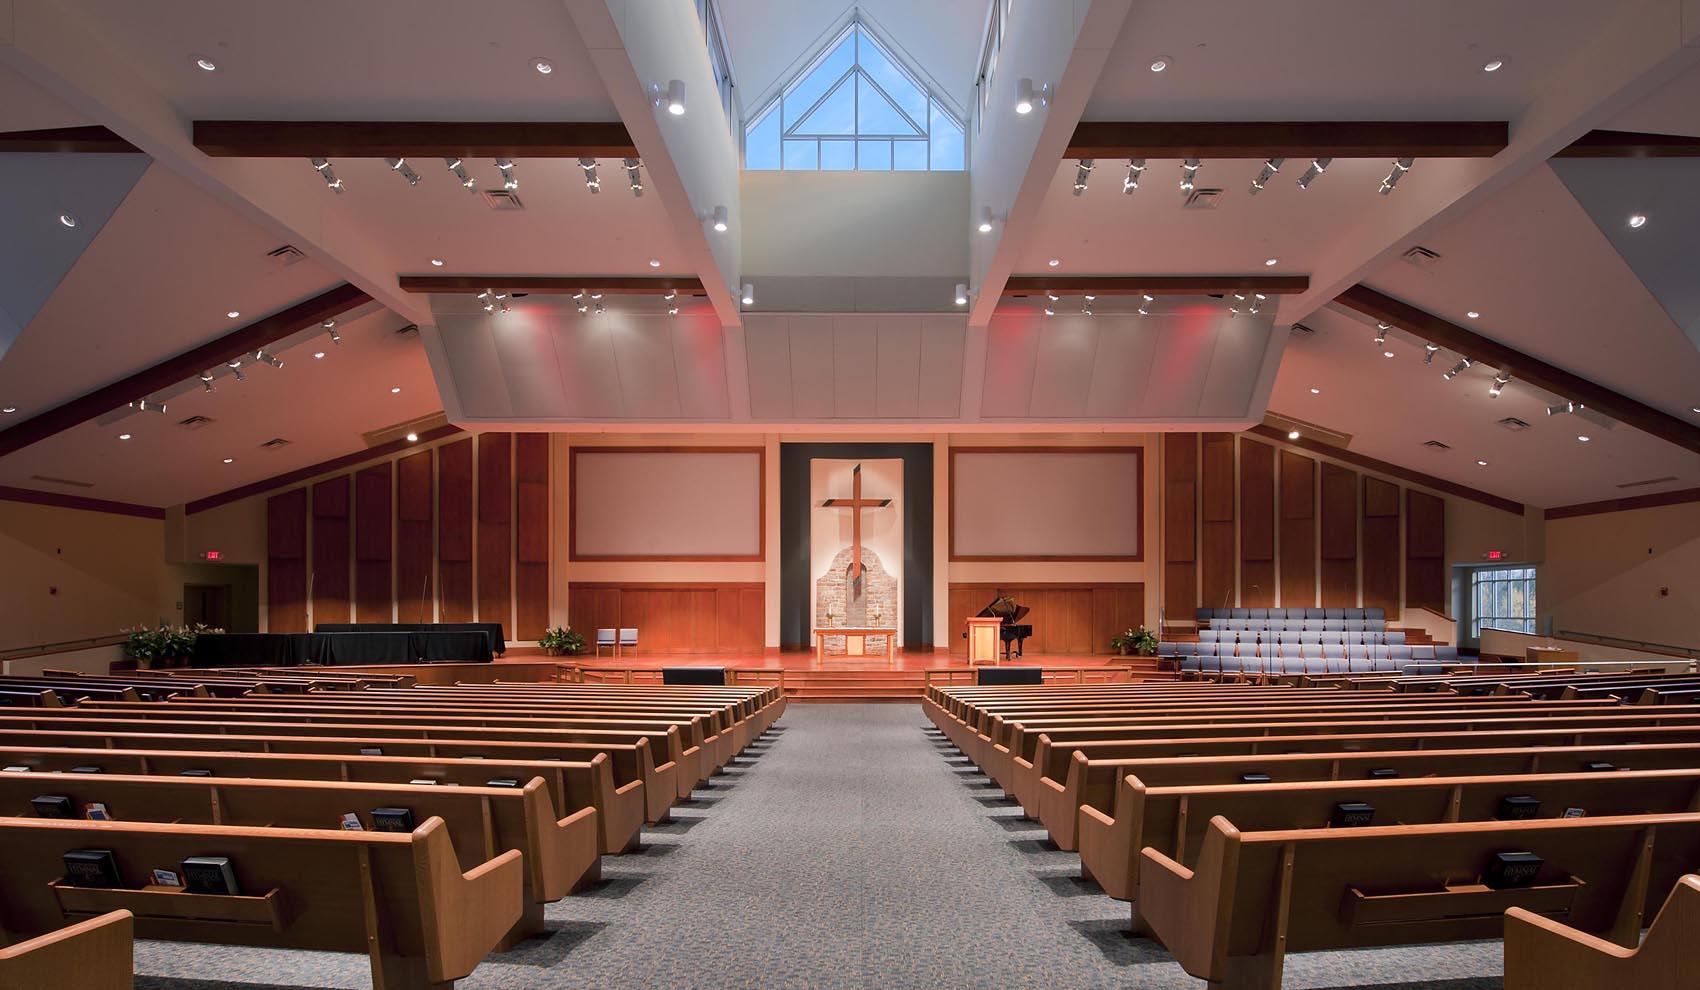 sanctuary from center aisle